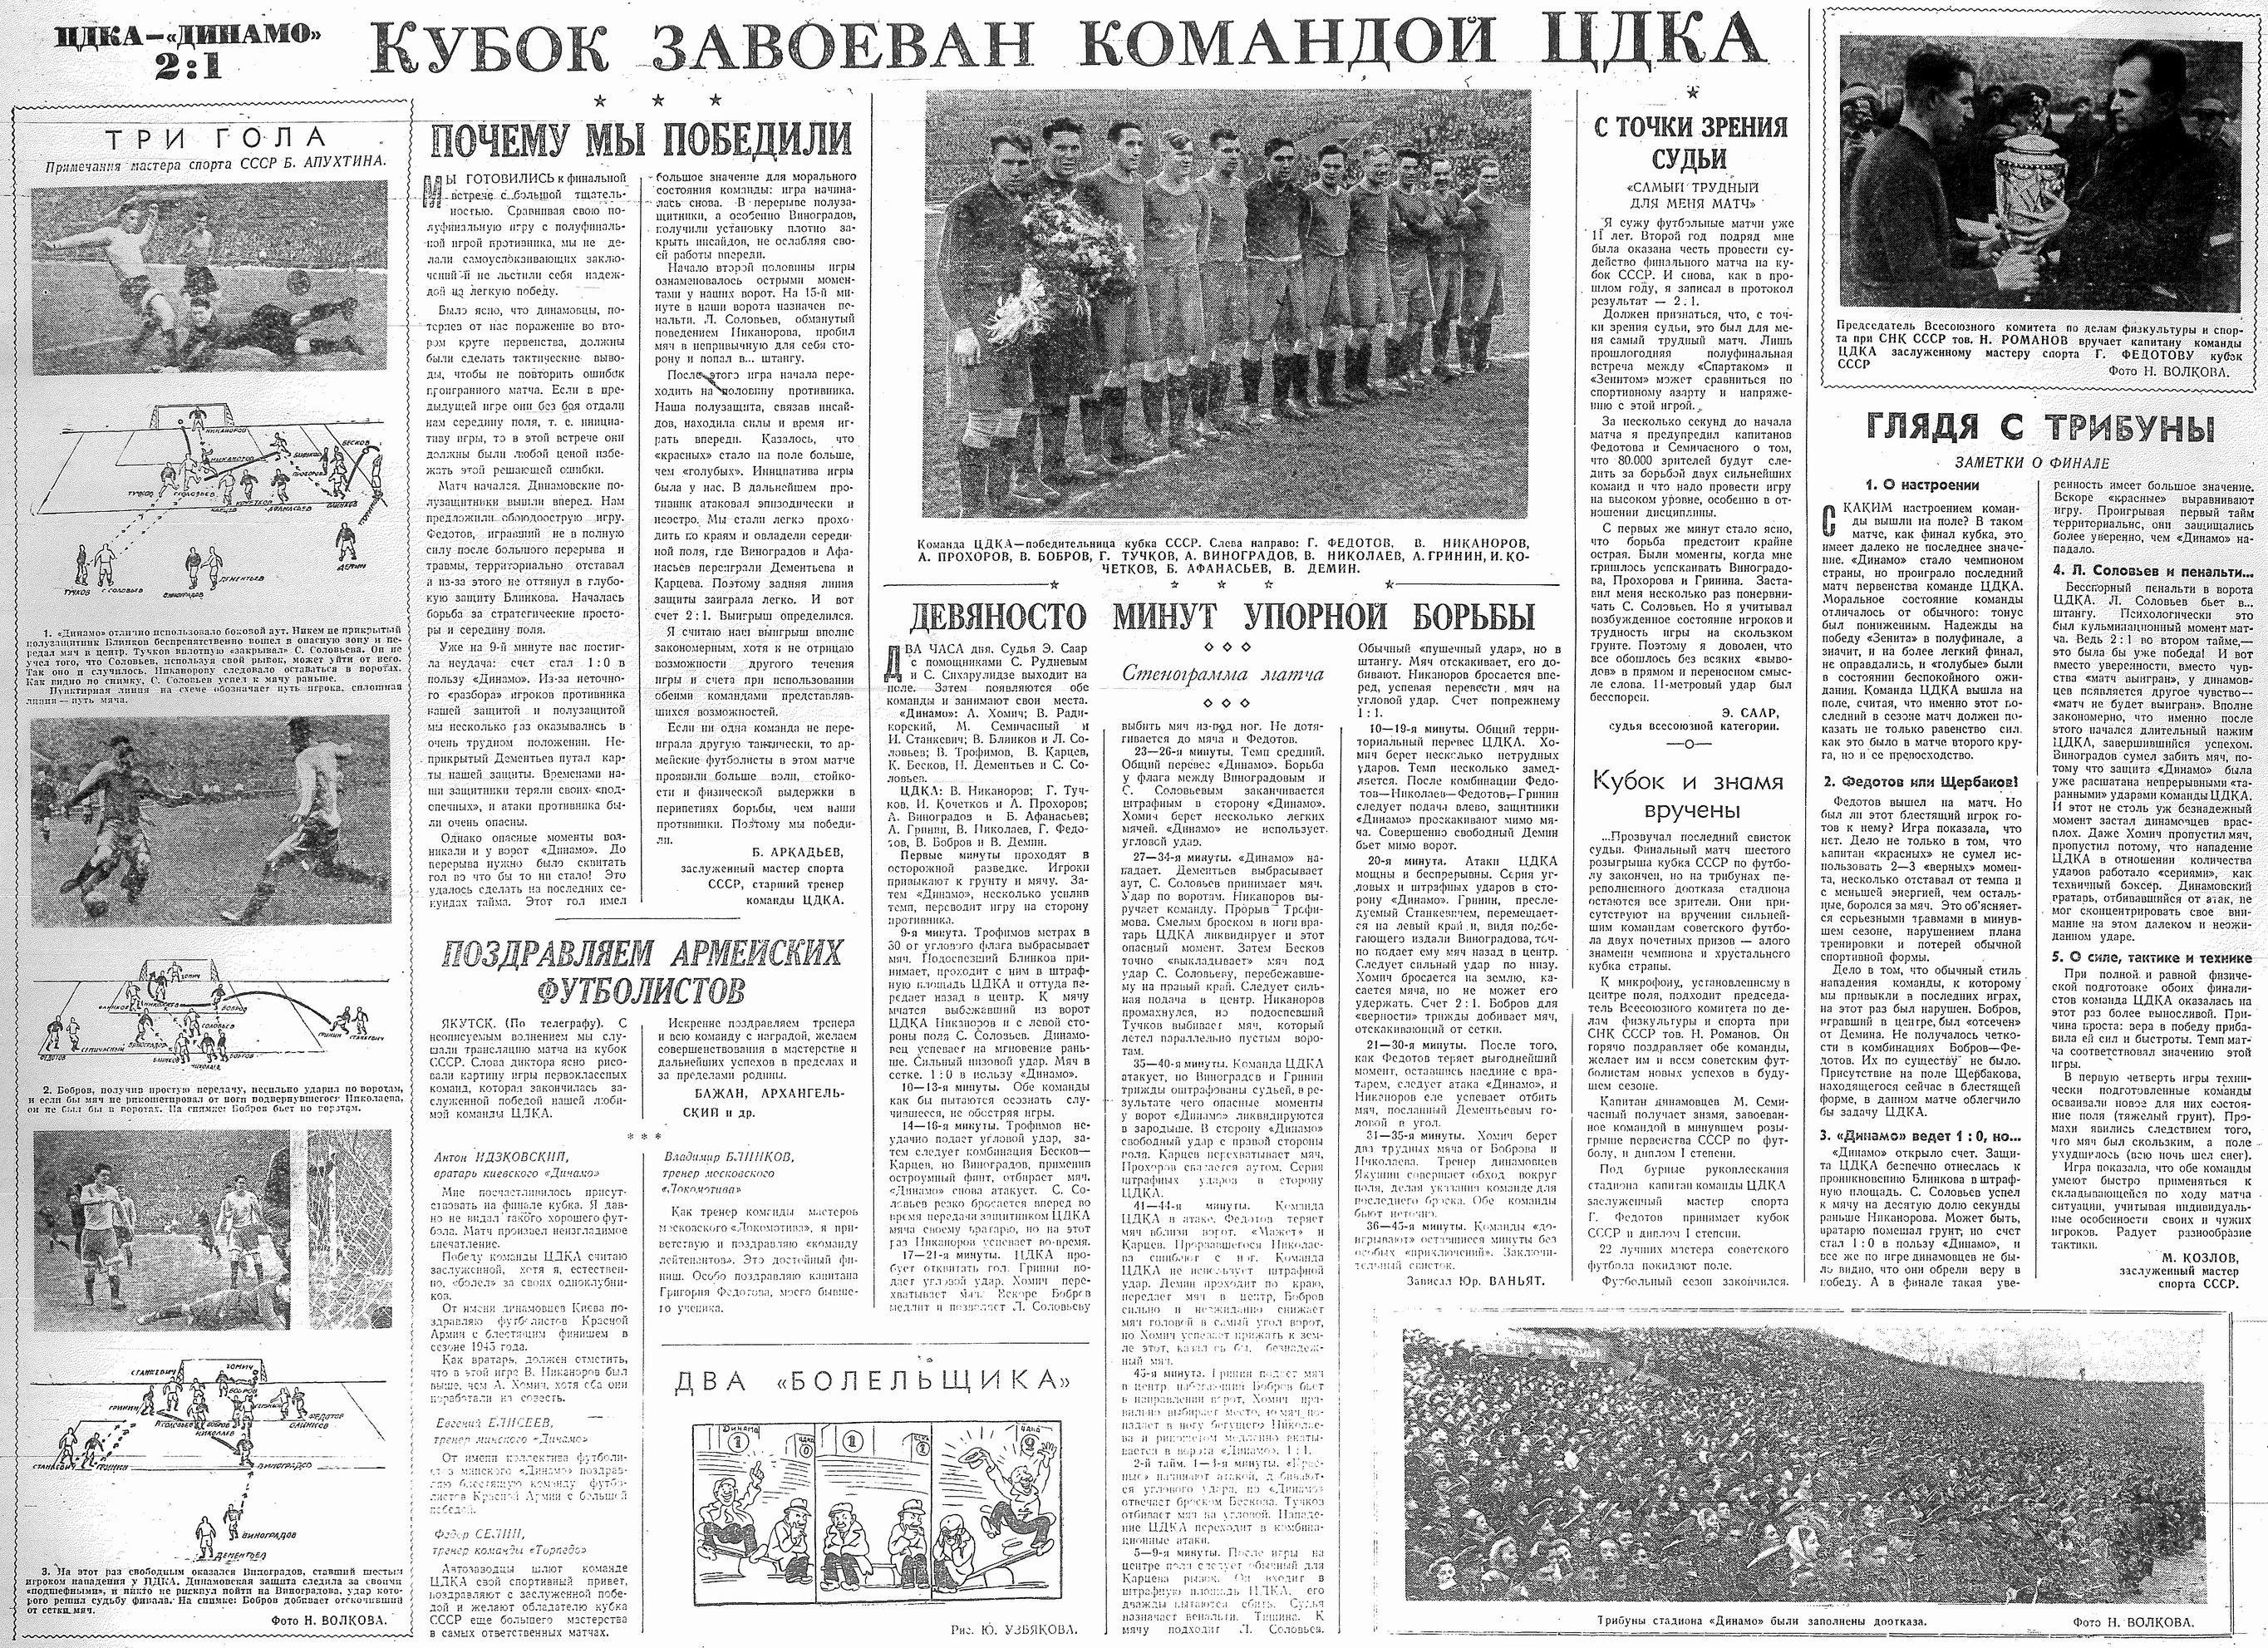 1945-10-14.CDKA-DinamoM.2.jpg